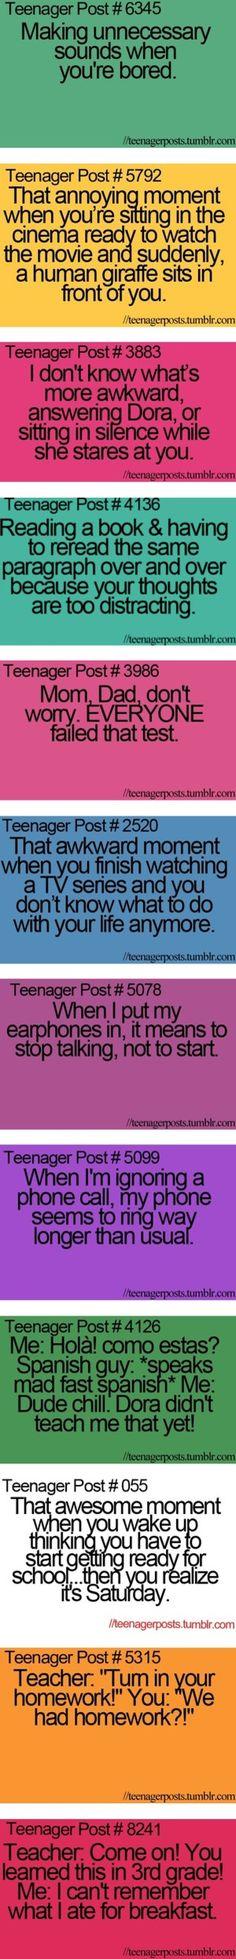 Teenager posts!